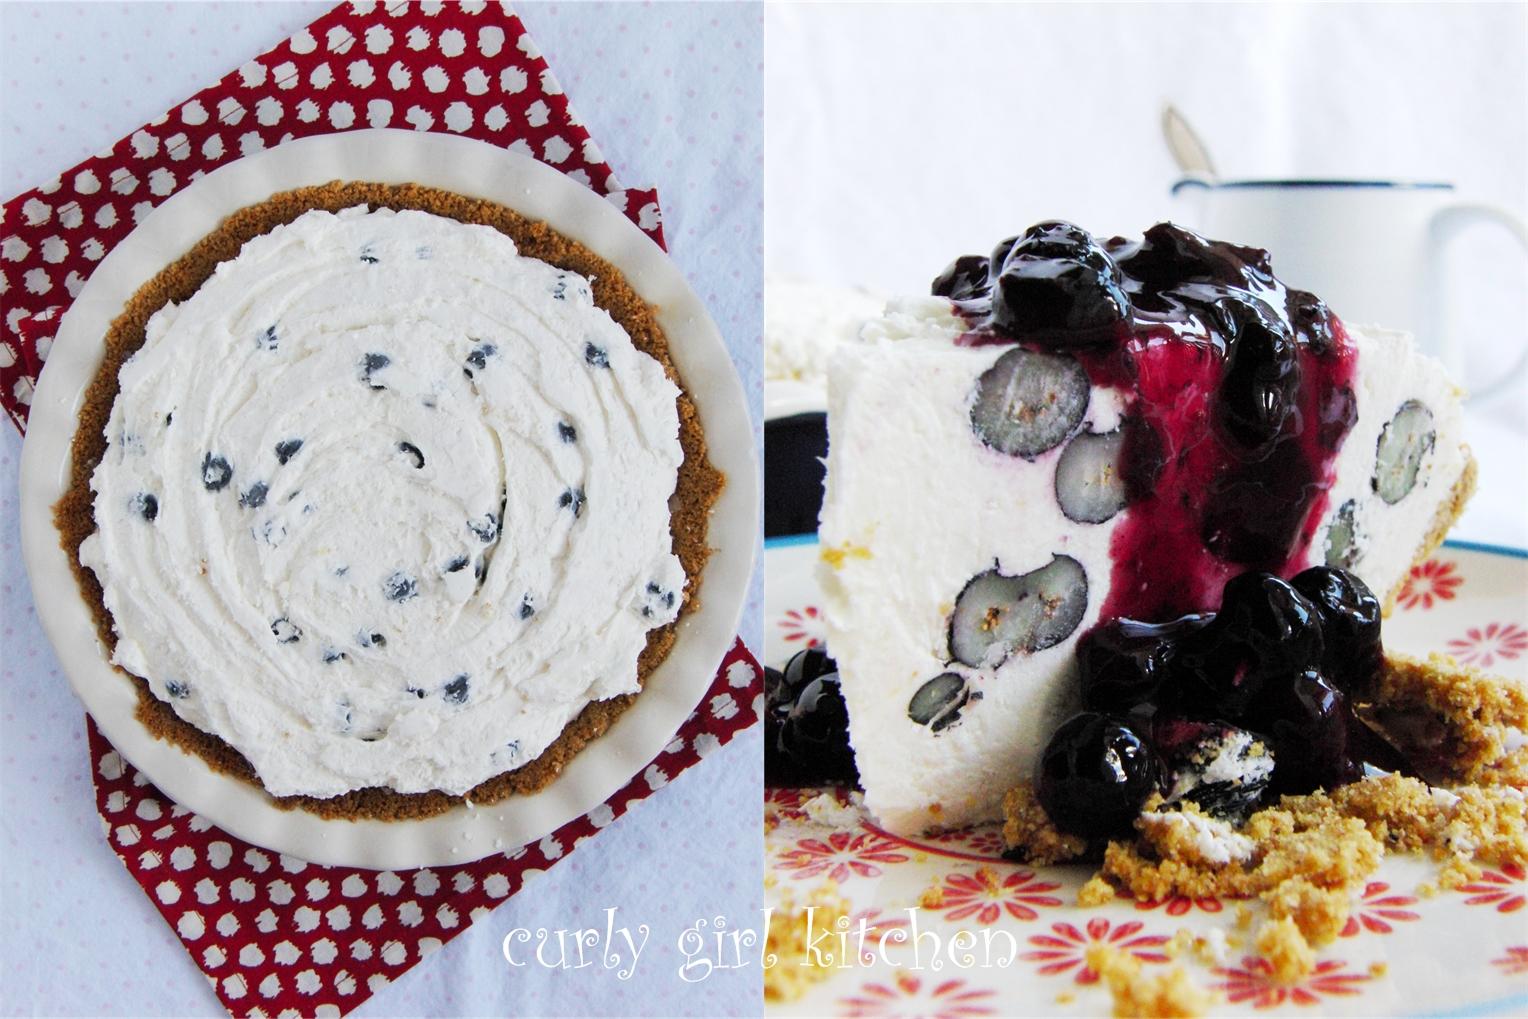 Curly Girl Kitchen: Blueberry Cheesecake Ice Cream Pie